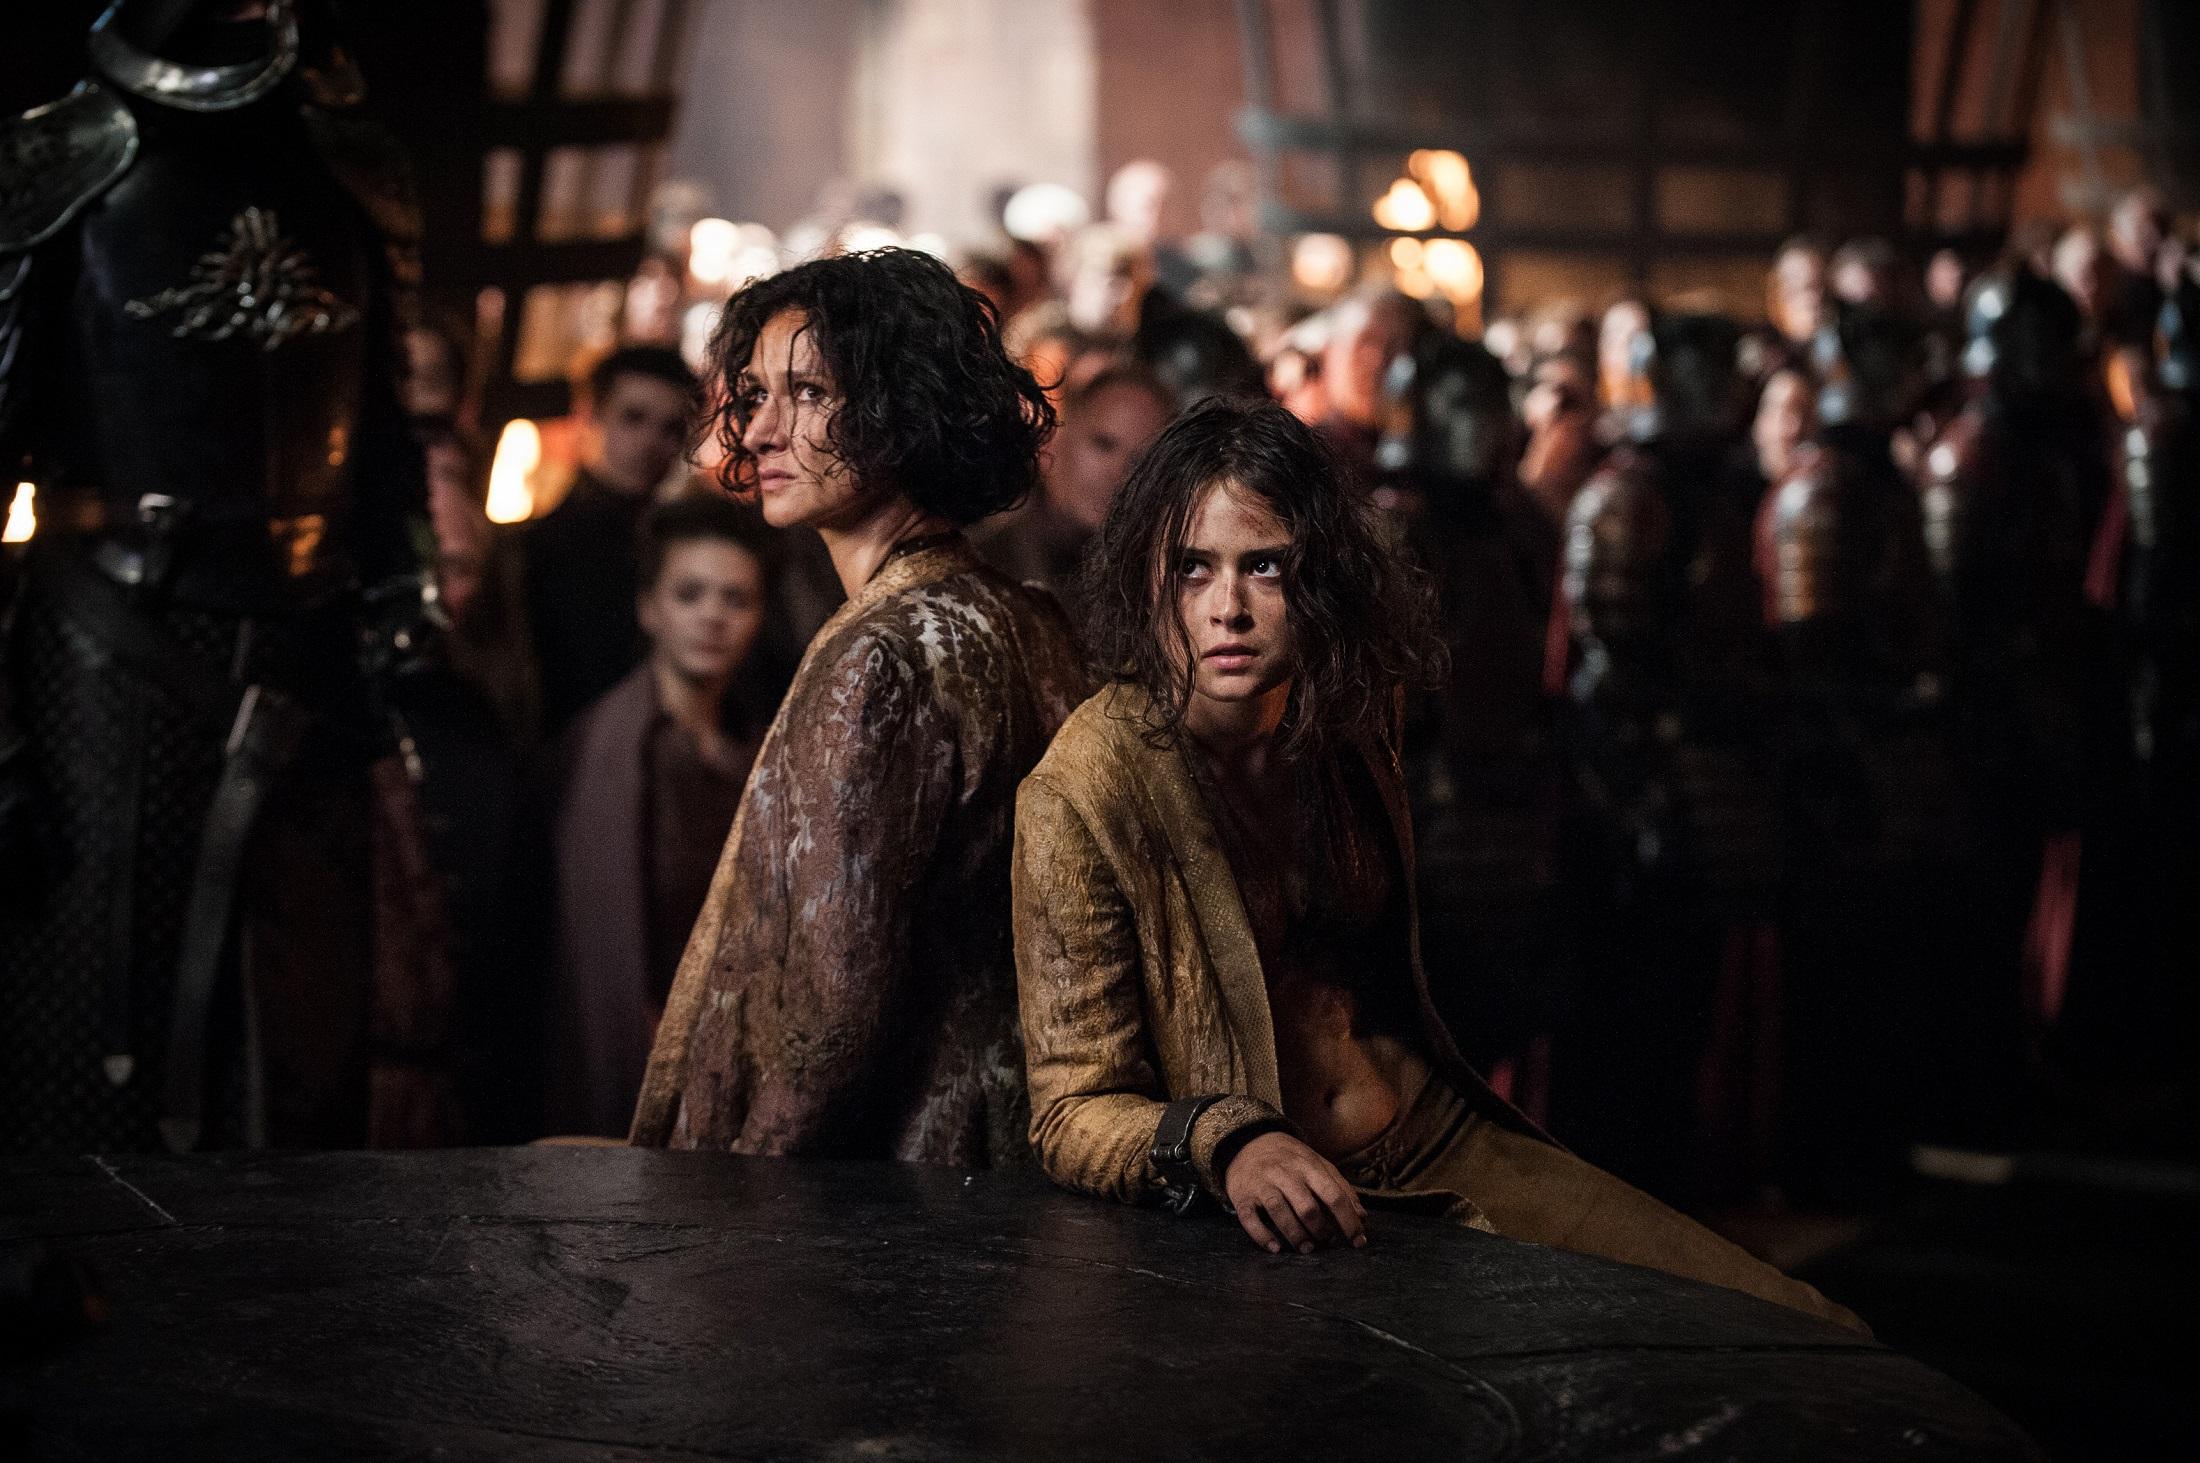 Unsullied Recap, Game of Thrones Season 7 Episode 3: The